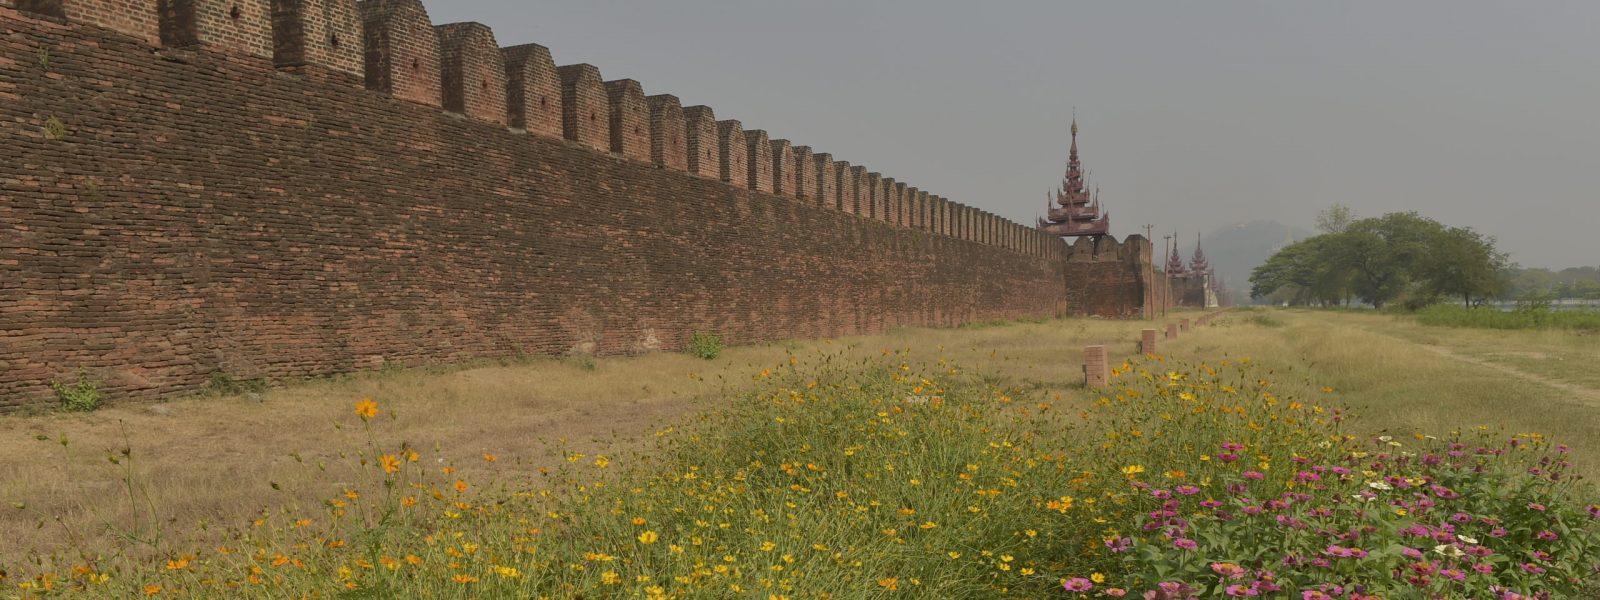 Mandalay - Royal Palace - Myanmar - Sampan Travel